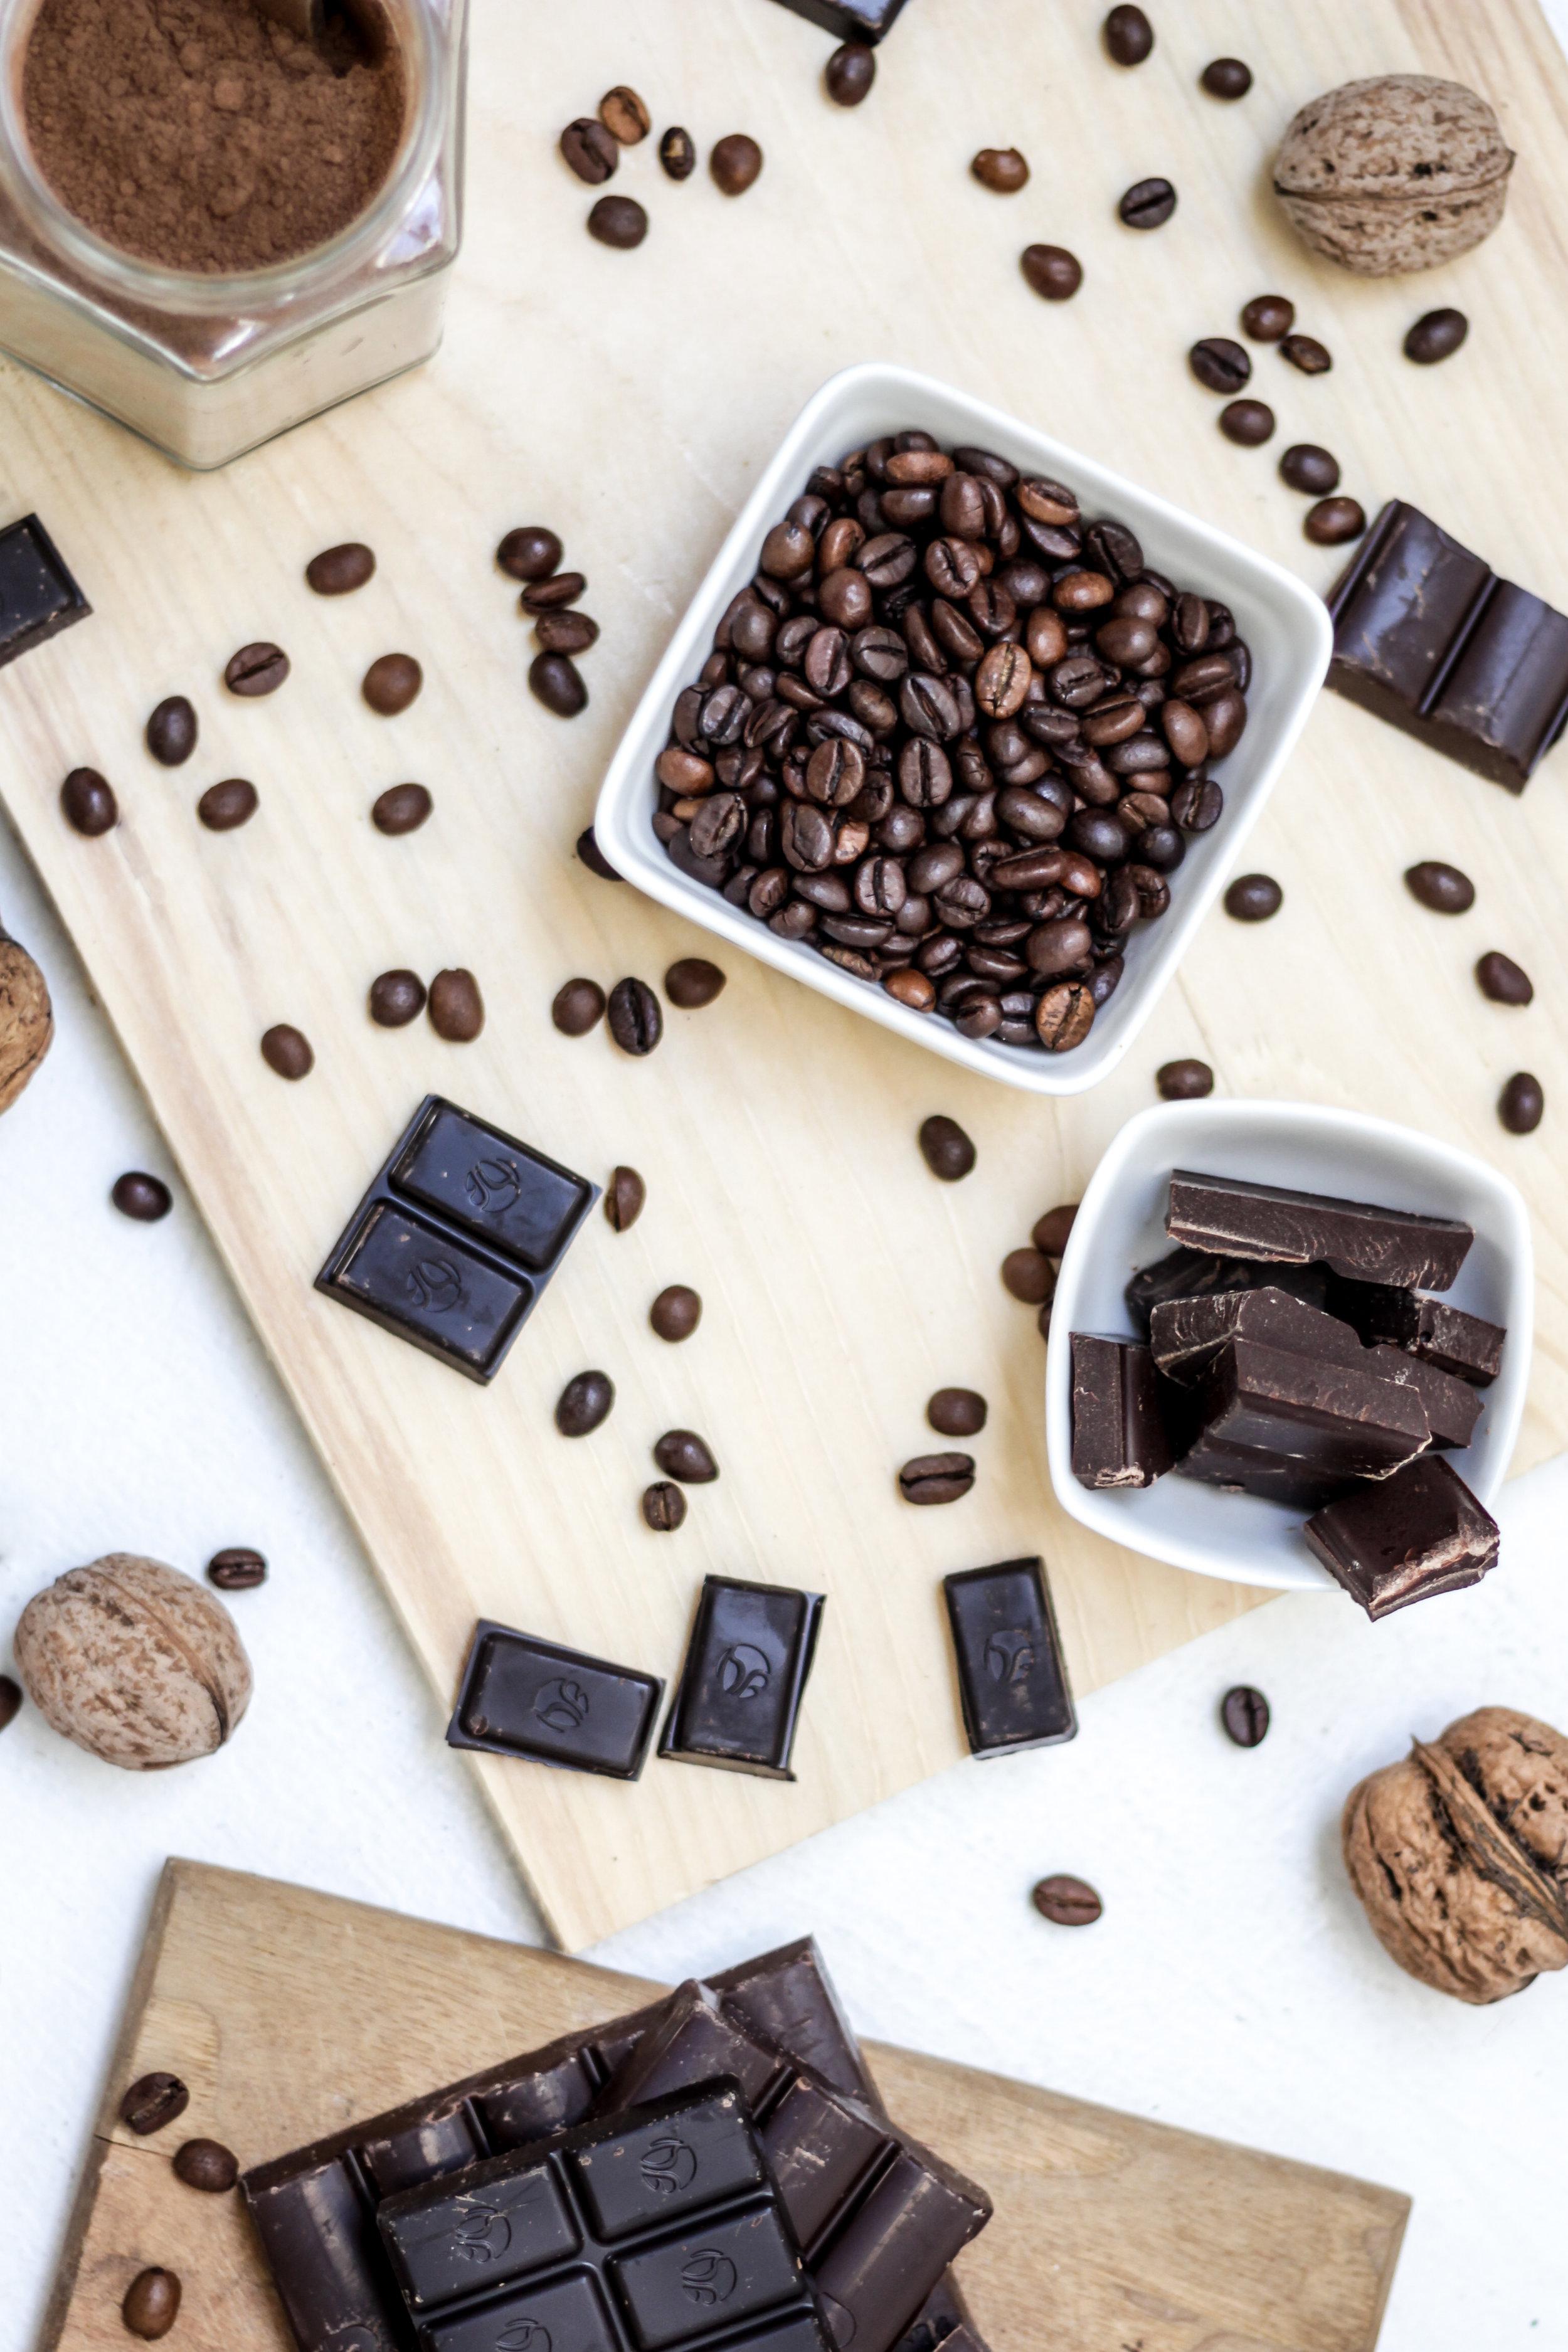 fair trade chocolate brands